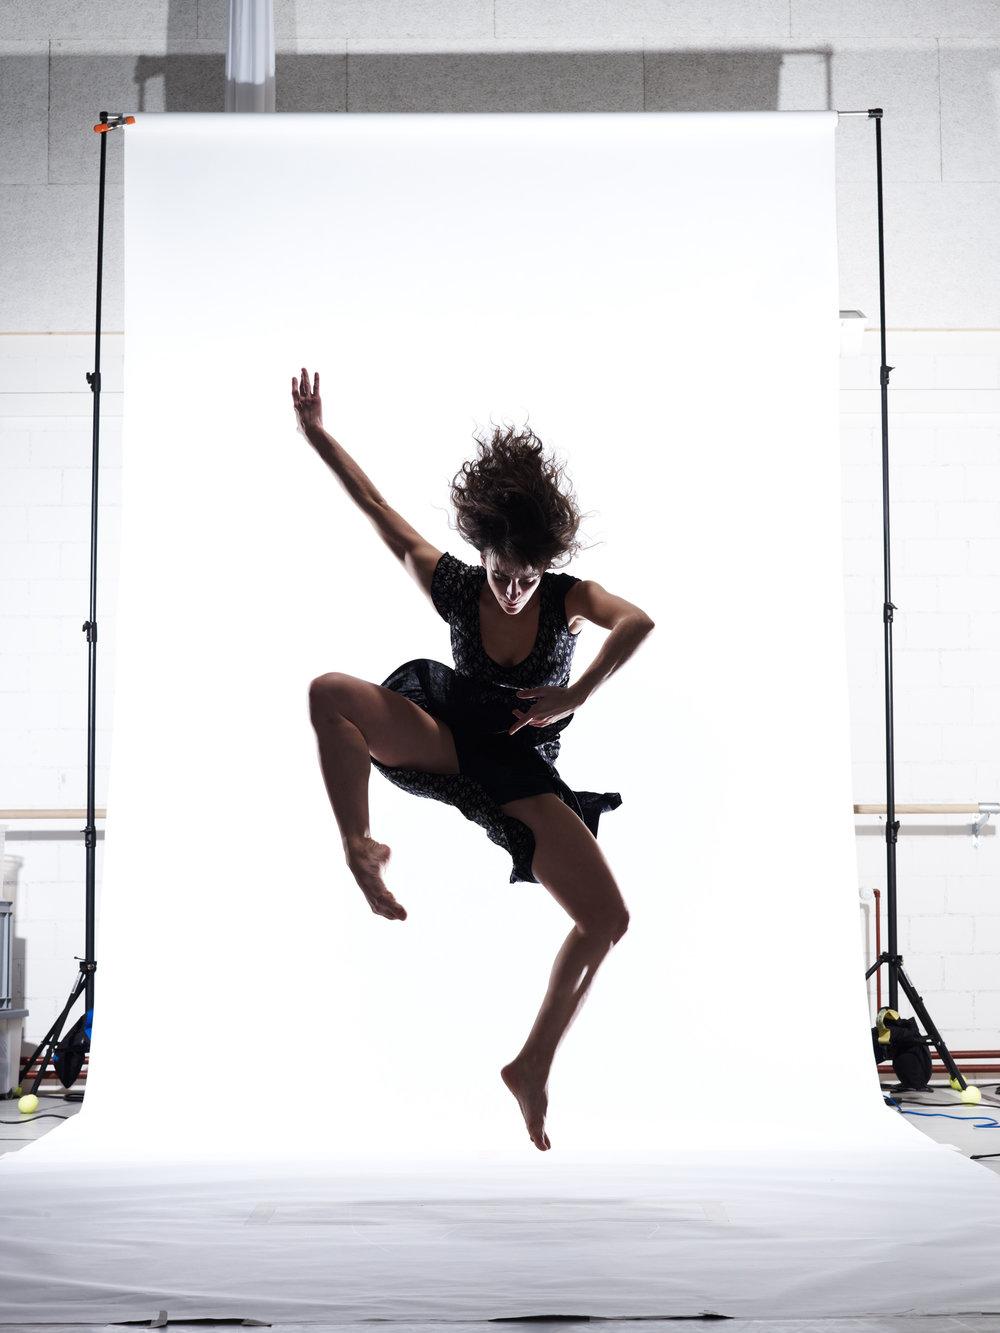 Bern_Ballet08_2-005997.jpg